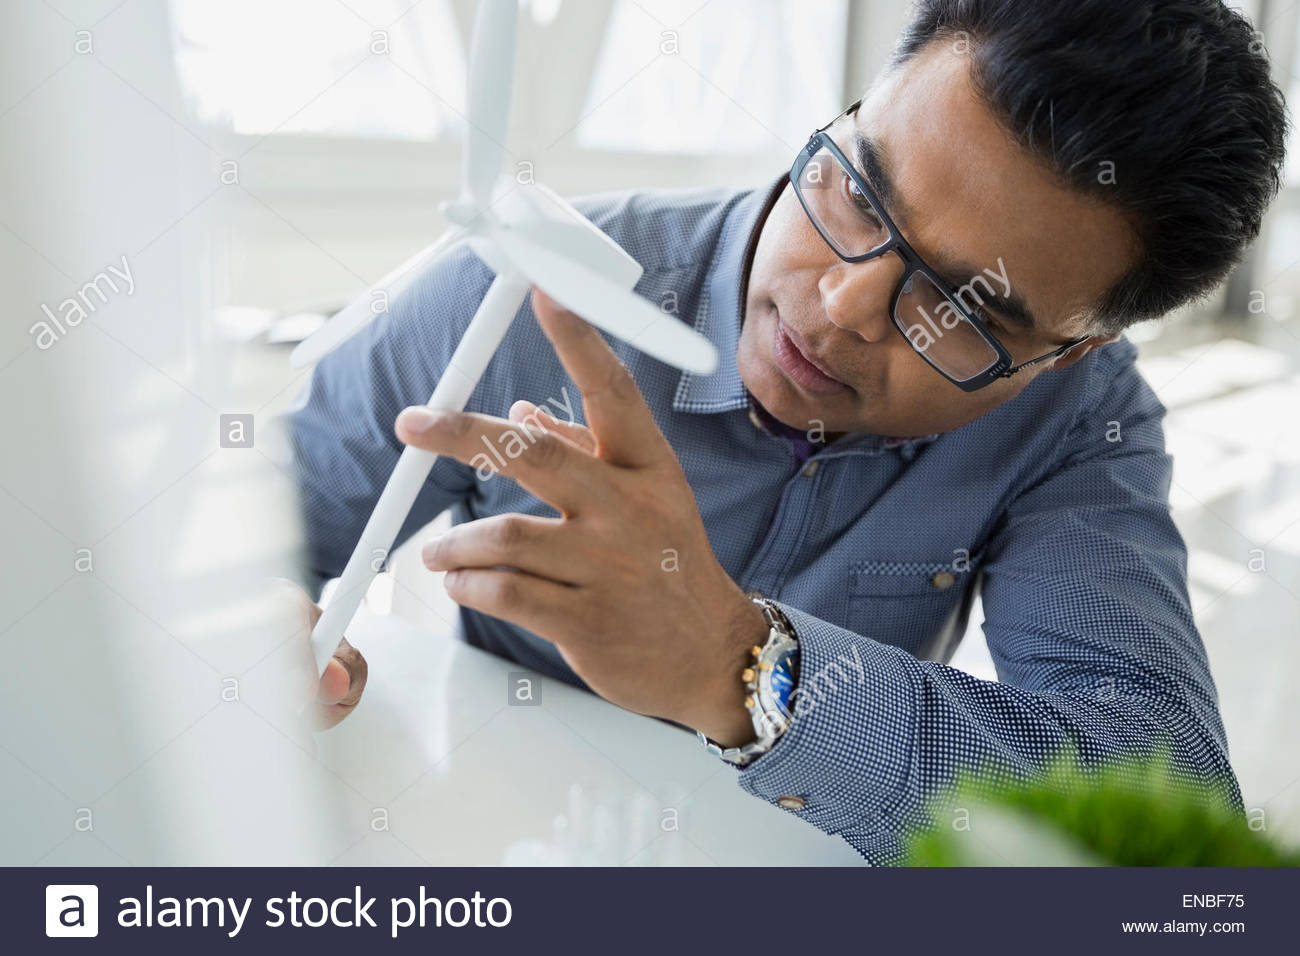 Serious scientist examining wind turbine model - Stock Image